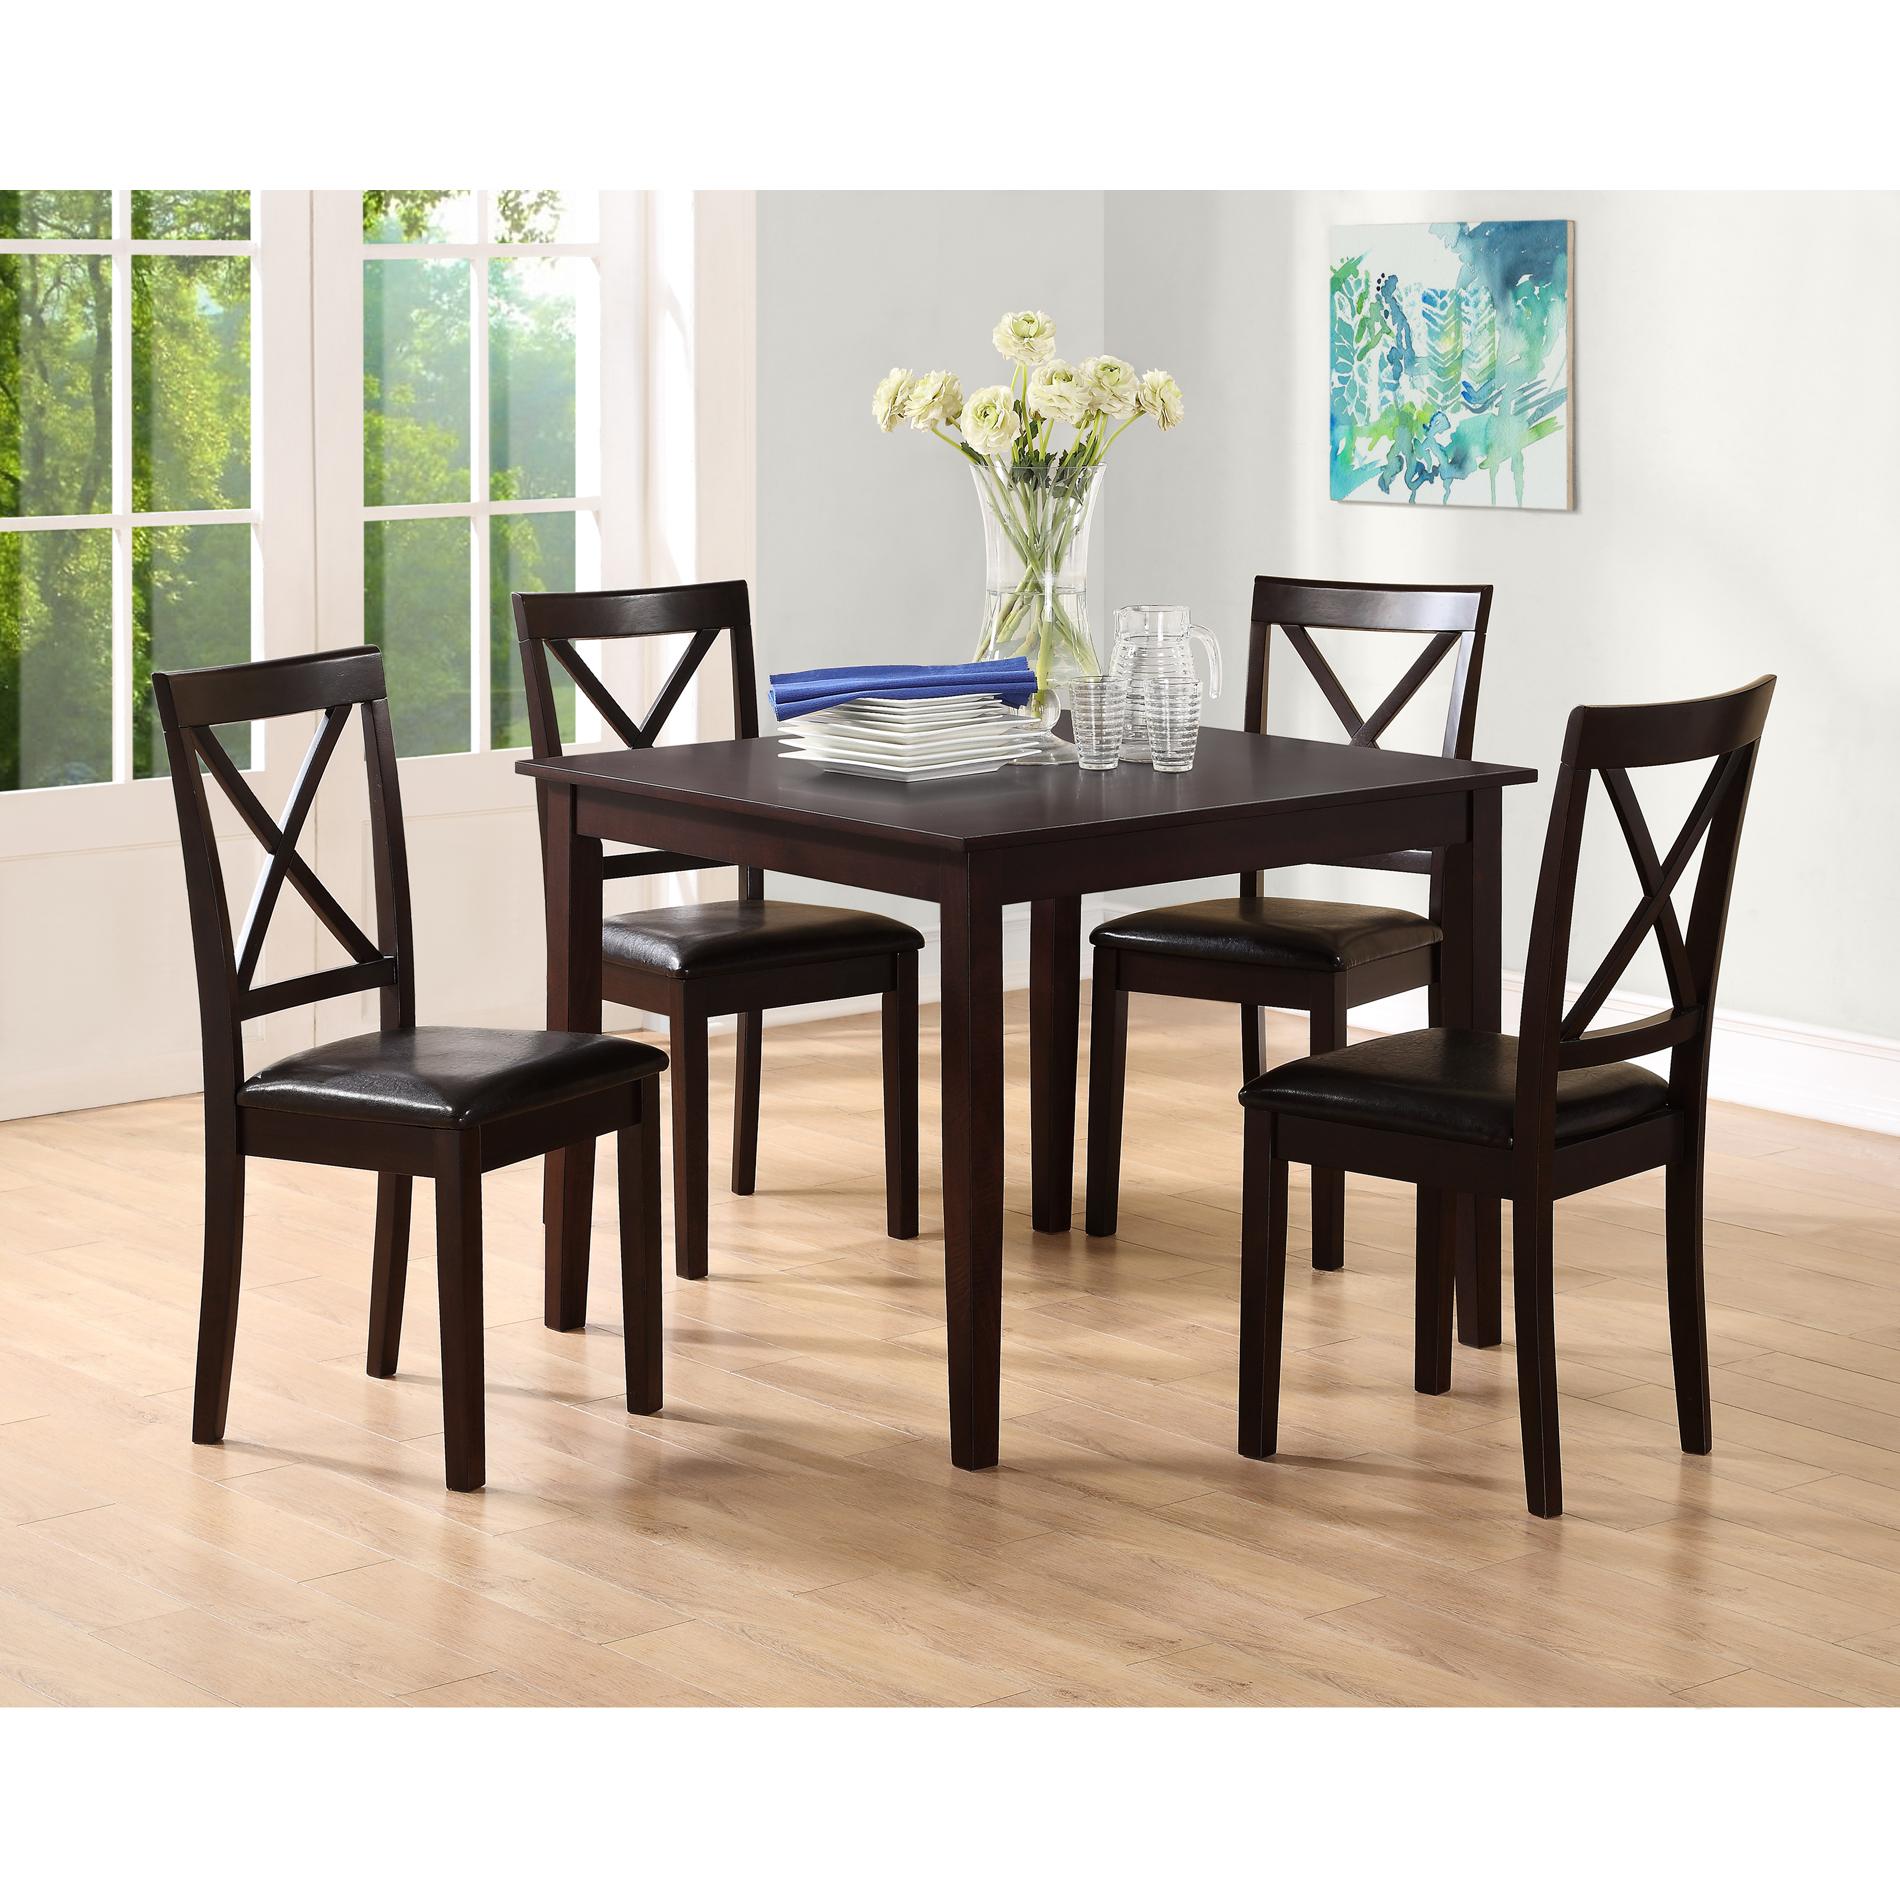 Essential Home Sydney 5 pc Dining Set  sc 1 st  Kmart & Dining Sets   Dining Room Table \u0026 Chair Sets - Kmart